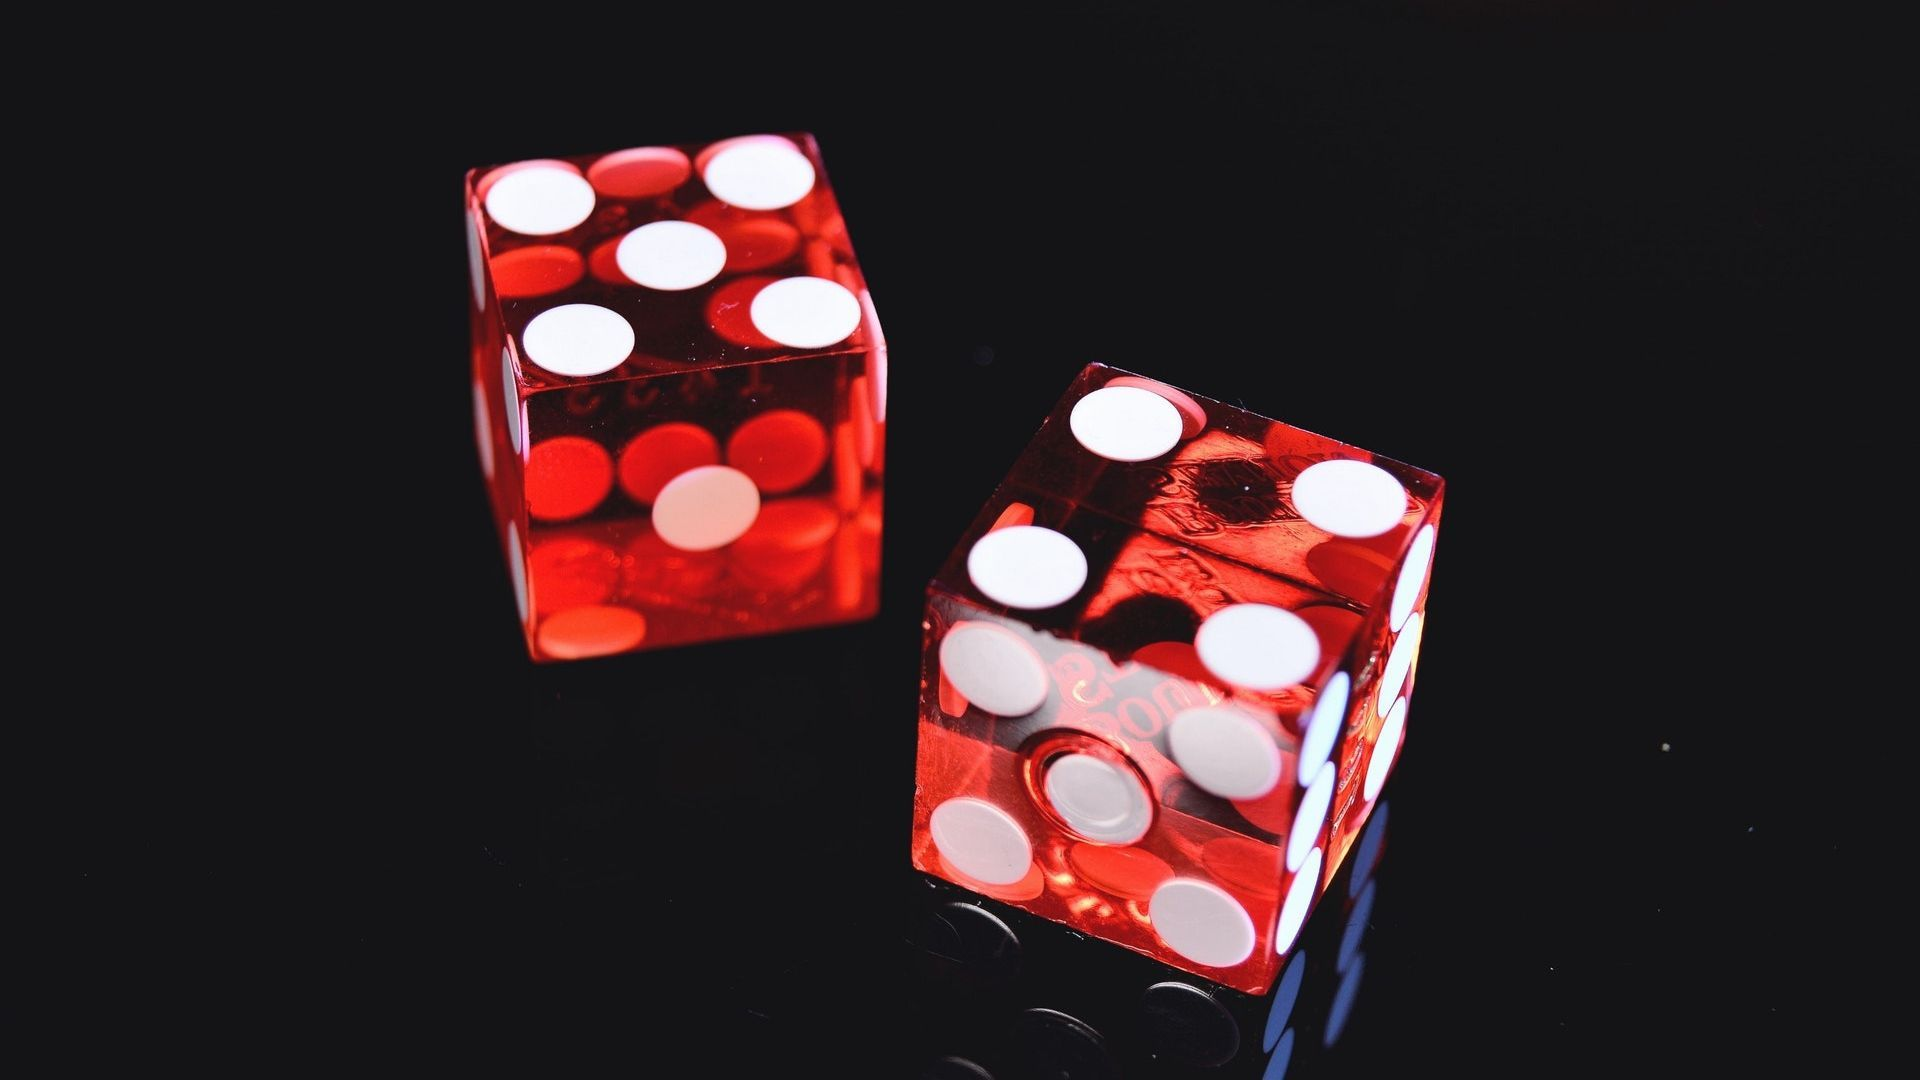 dice wallpapers